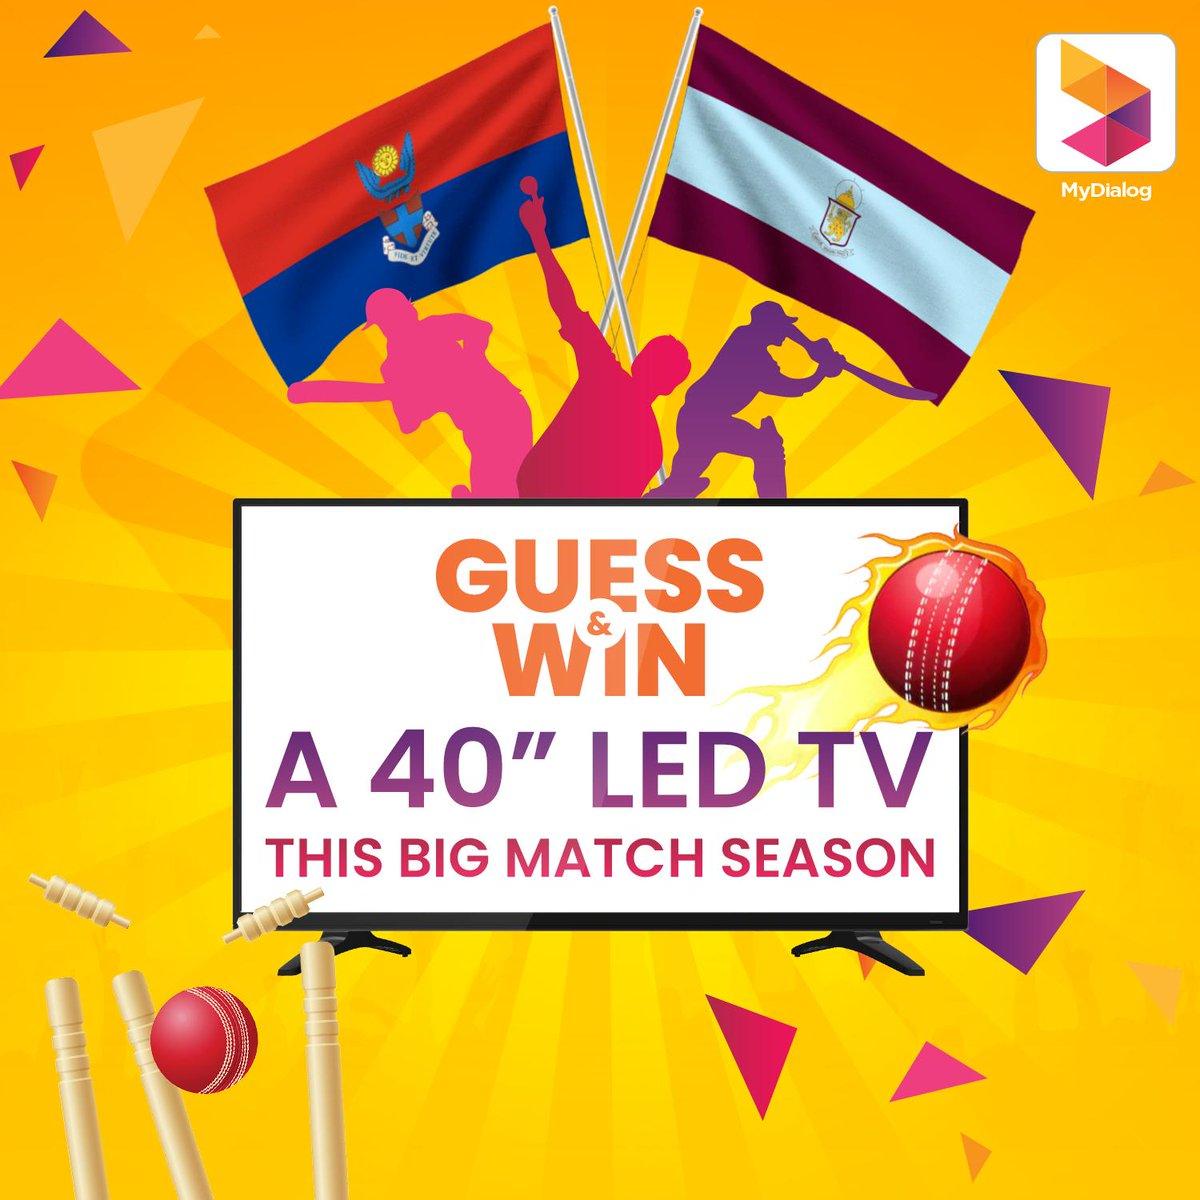 Guess the winner of the Kingswood vs Dharmaraja big match